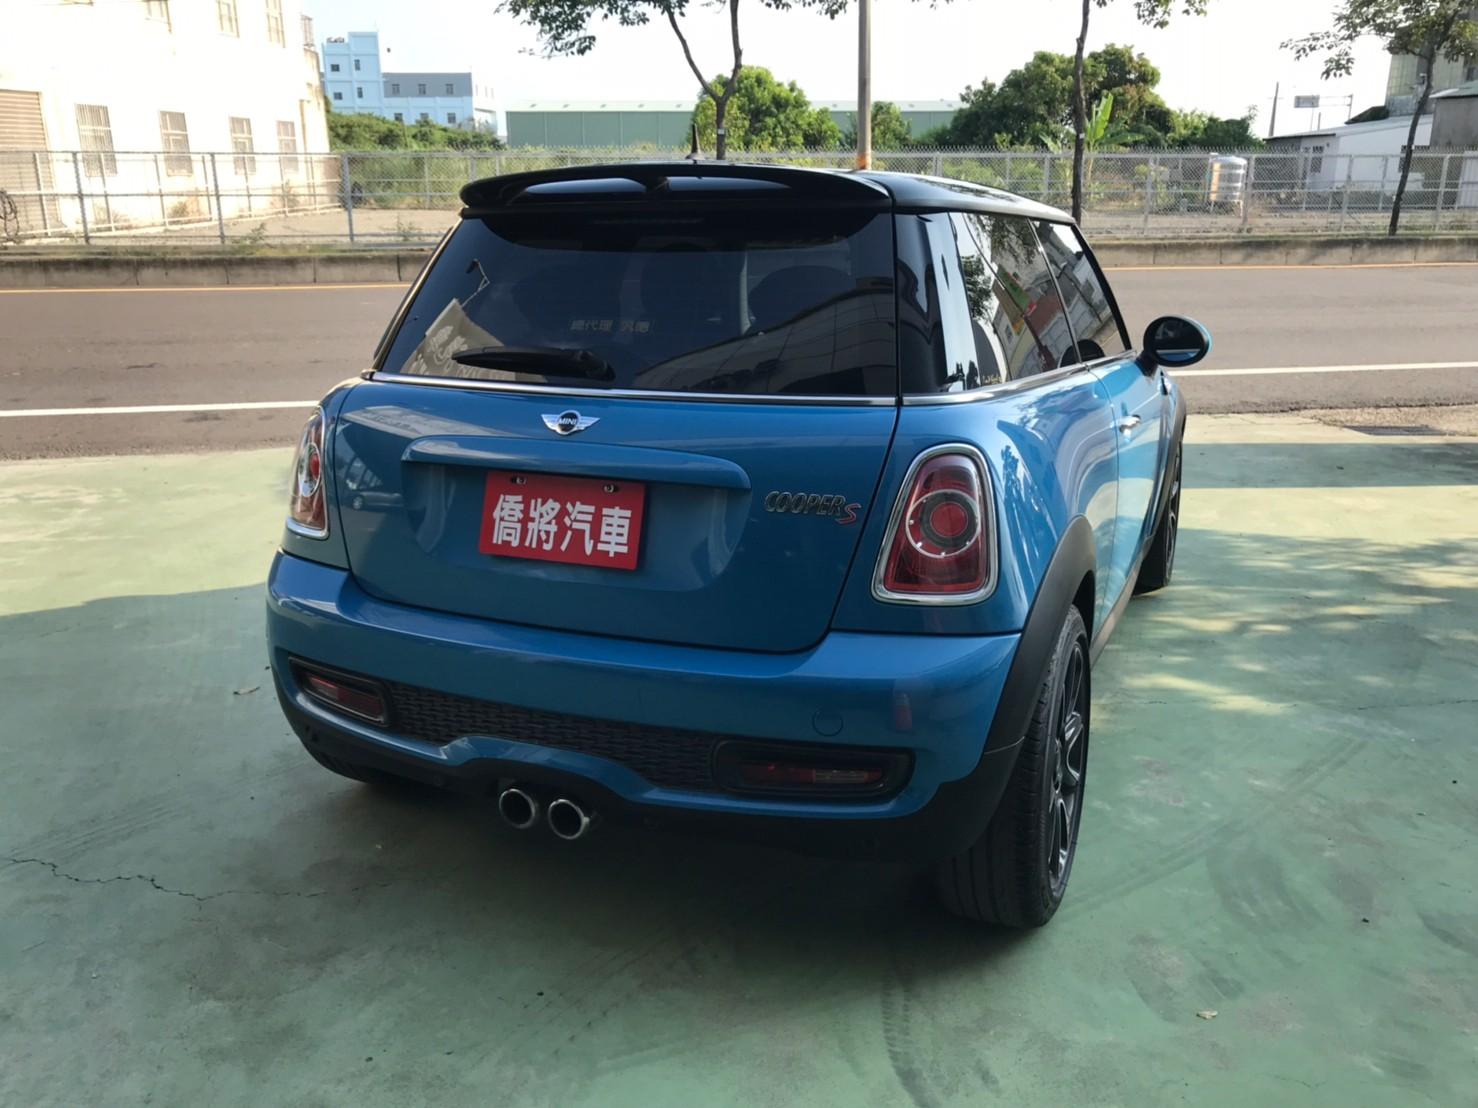 LINE_ALBUM_20129 特仕版COOPER S。17吋鋁圈。雙排氣尾管 保證一手女用車  夢想玩具車 59.9_210919_4